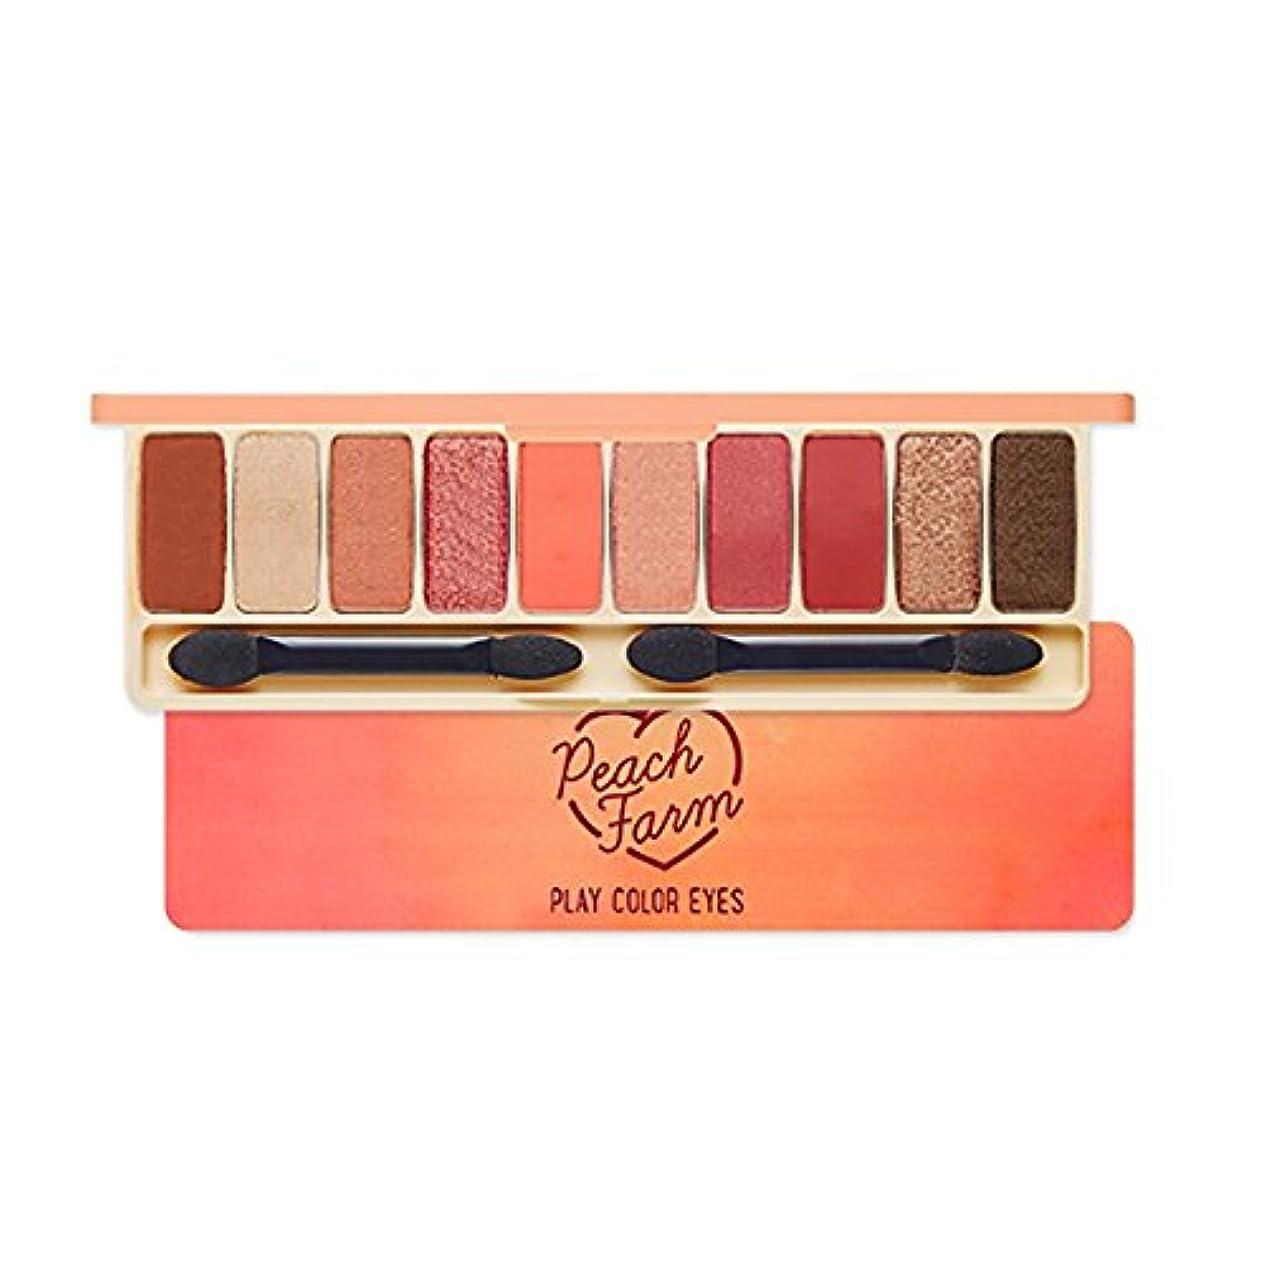 Etude House エチュードハウス New Play Color Eyes Peach Farm Eyeshadow palette アイシャドーパレット 1g*10